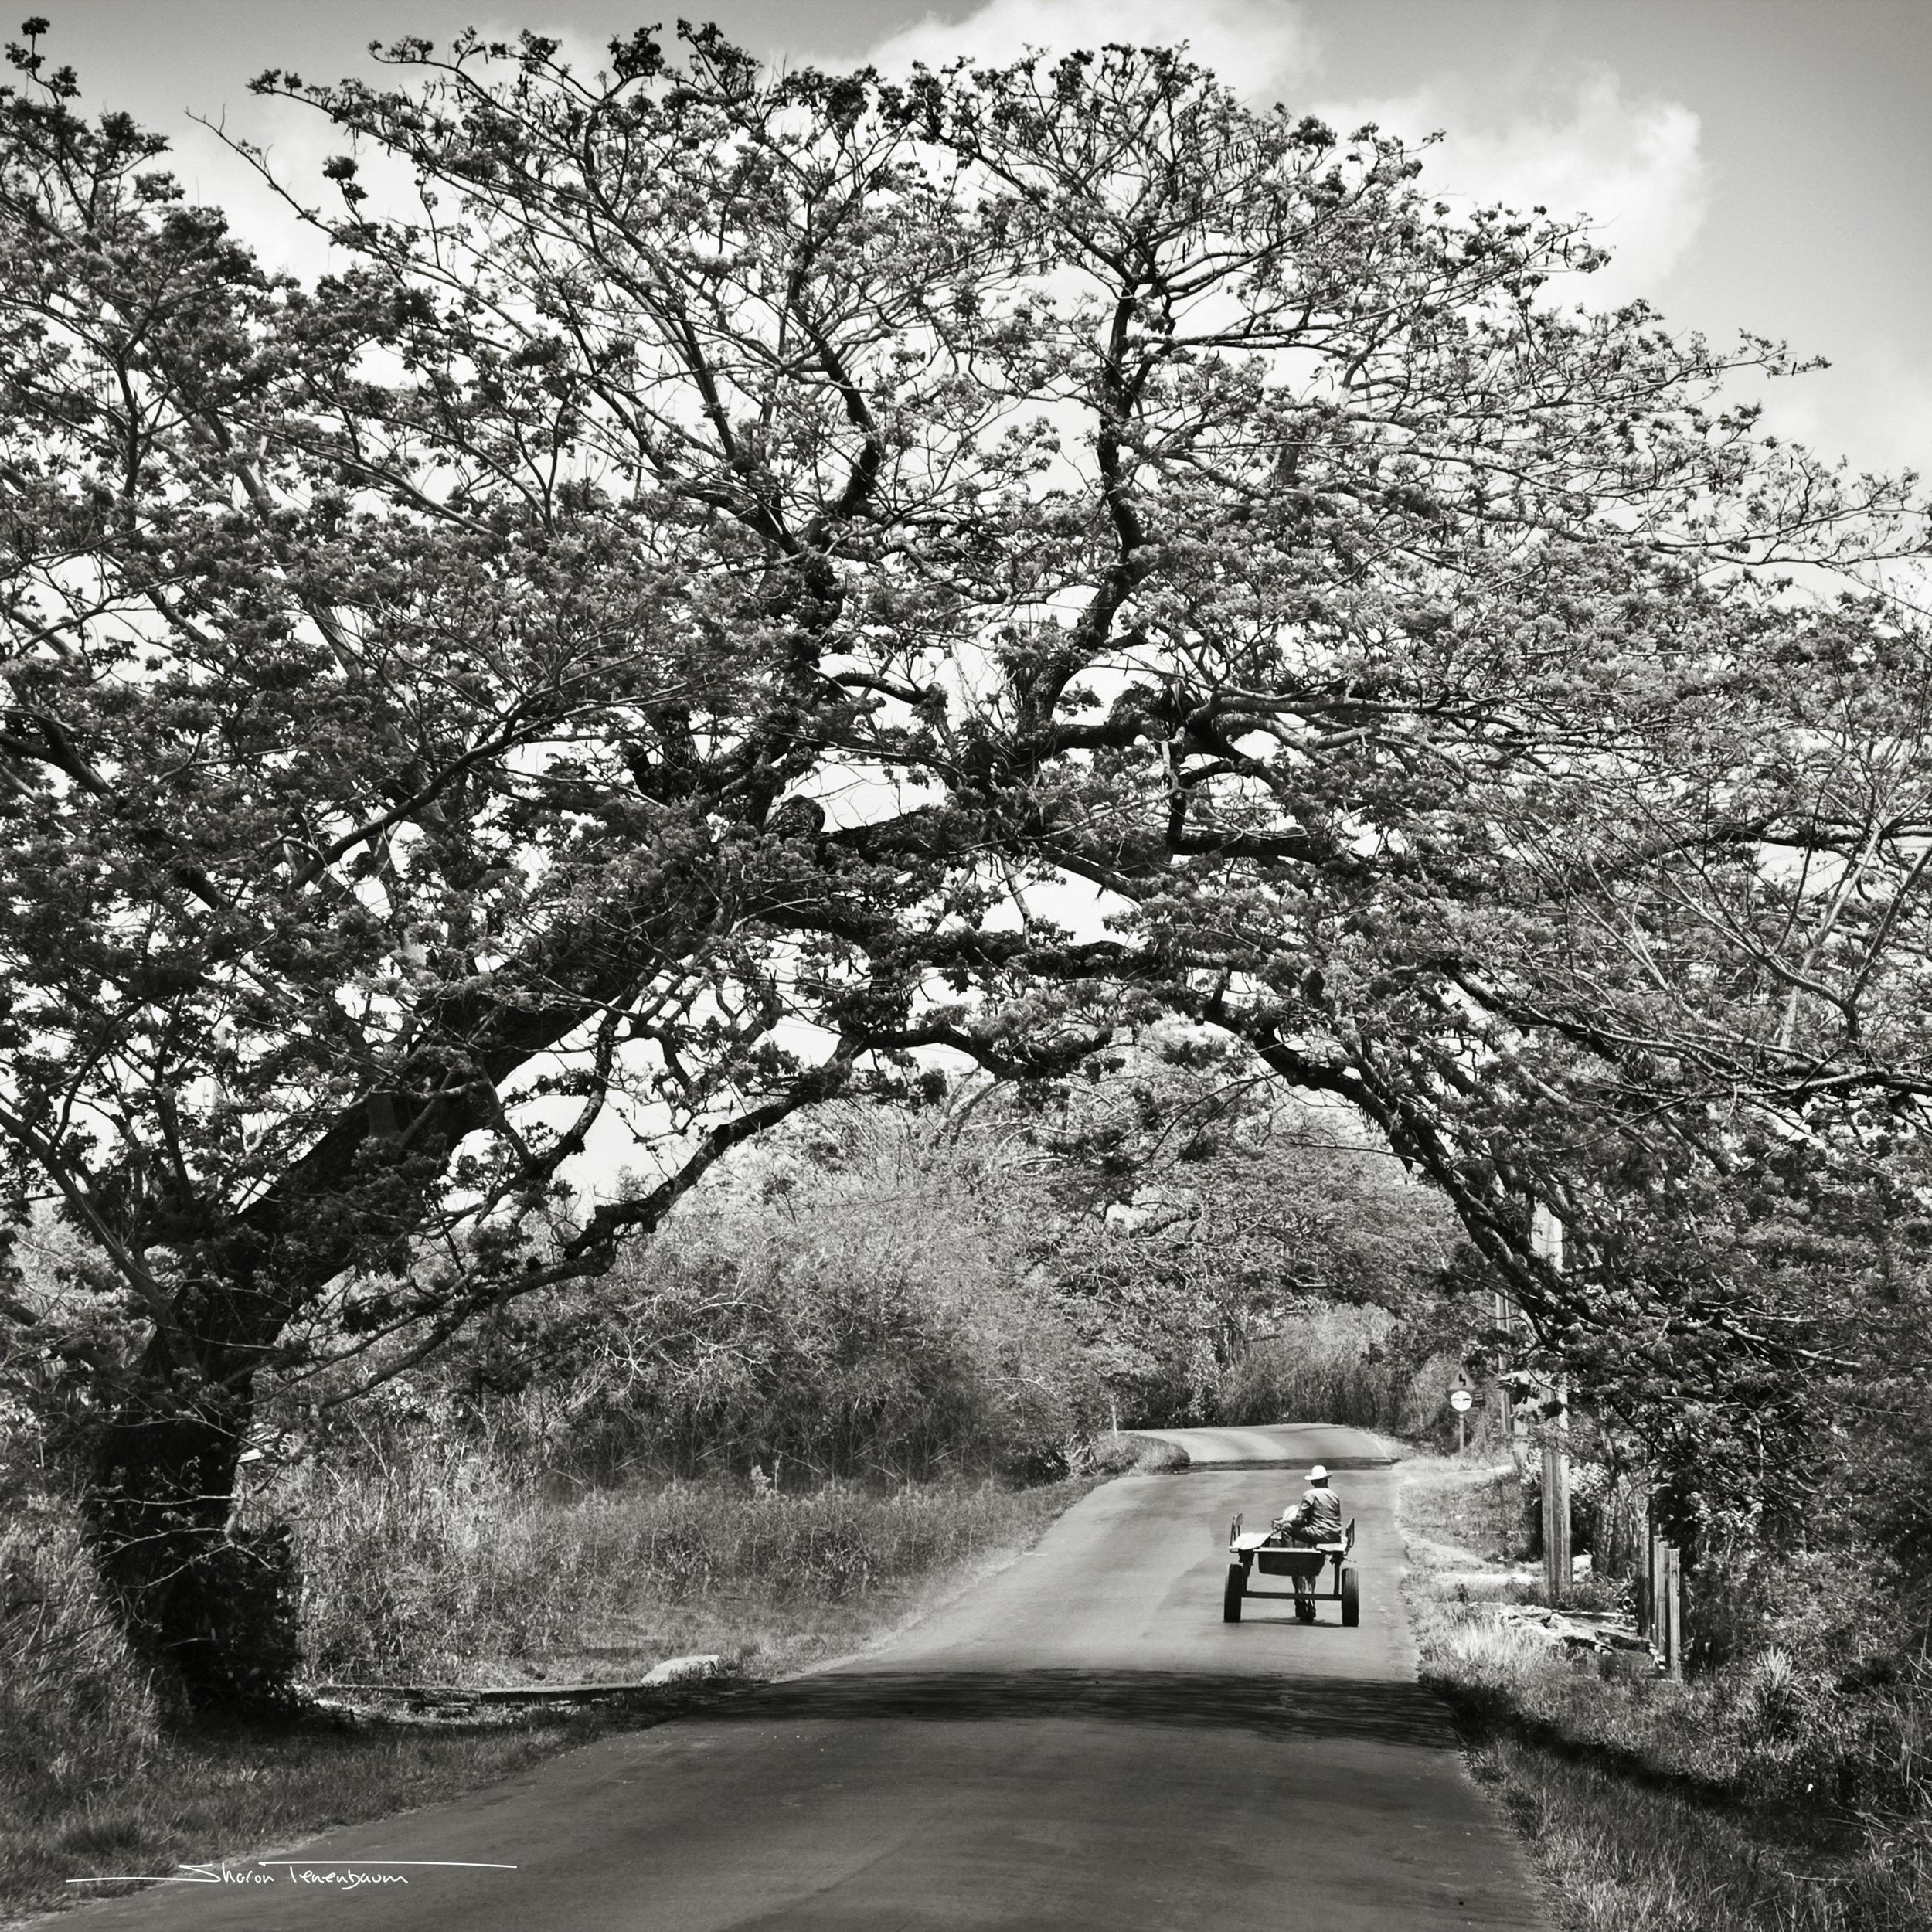 Cuban Tree - Original Black and White Photograph